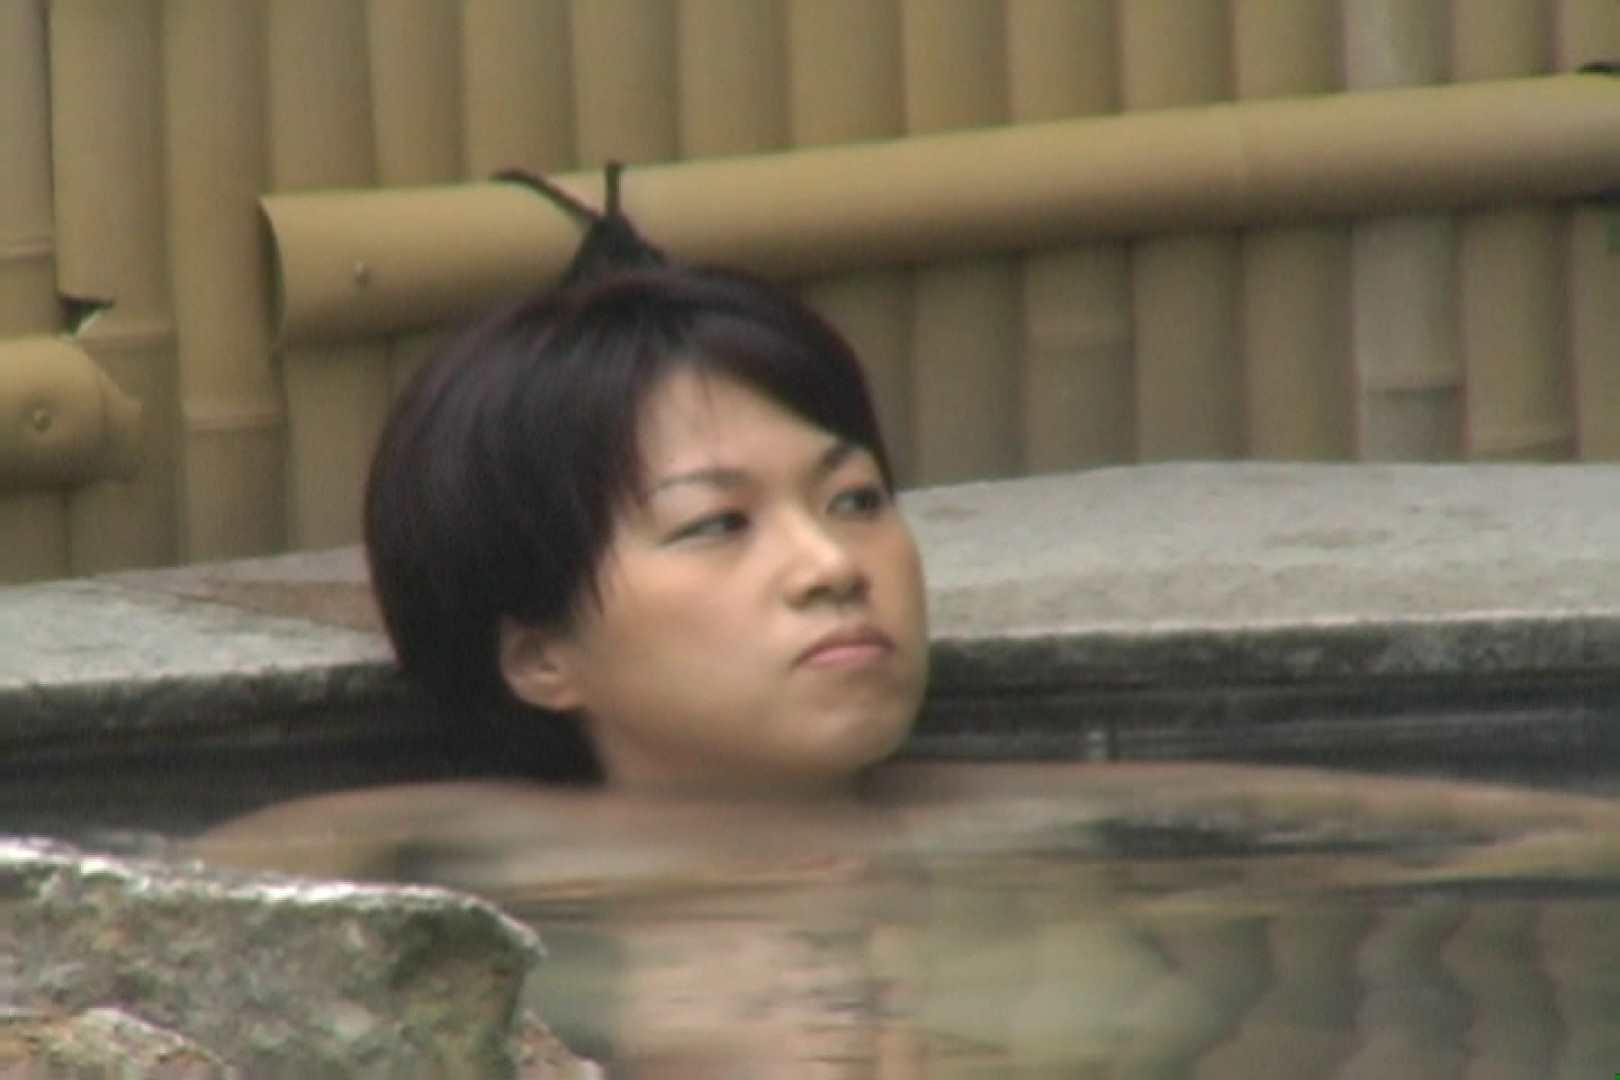 Aquaな露天風呂Vol.624 露天   OLセックス  52画像 28